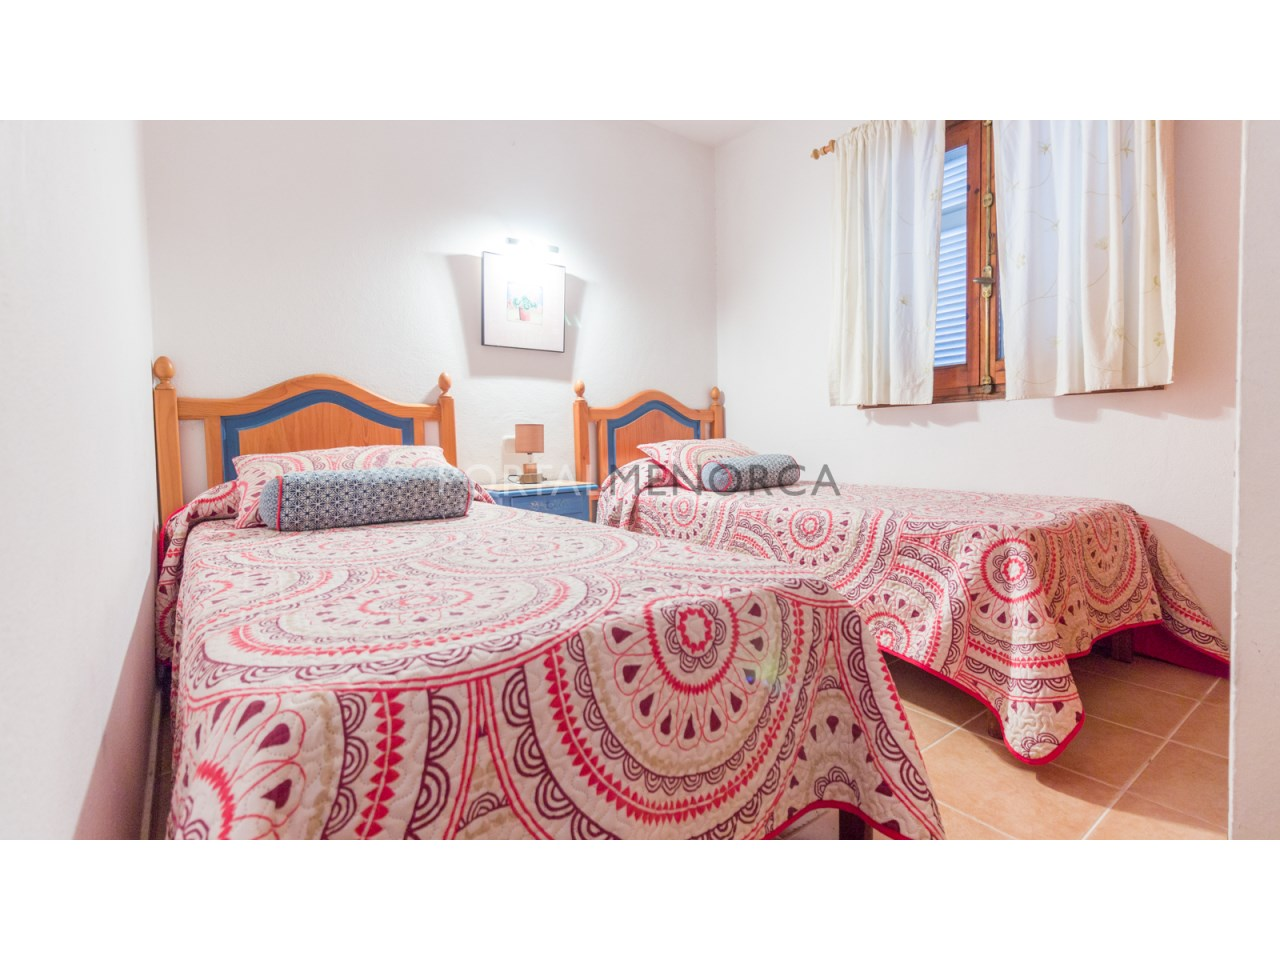 apartament for sale in calan porter menorca (6 de 7)